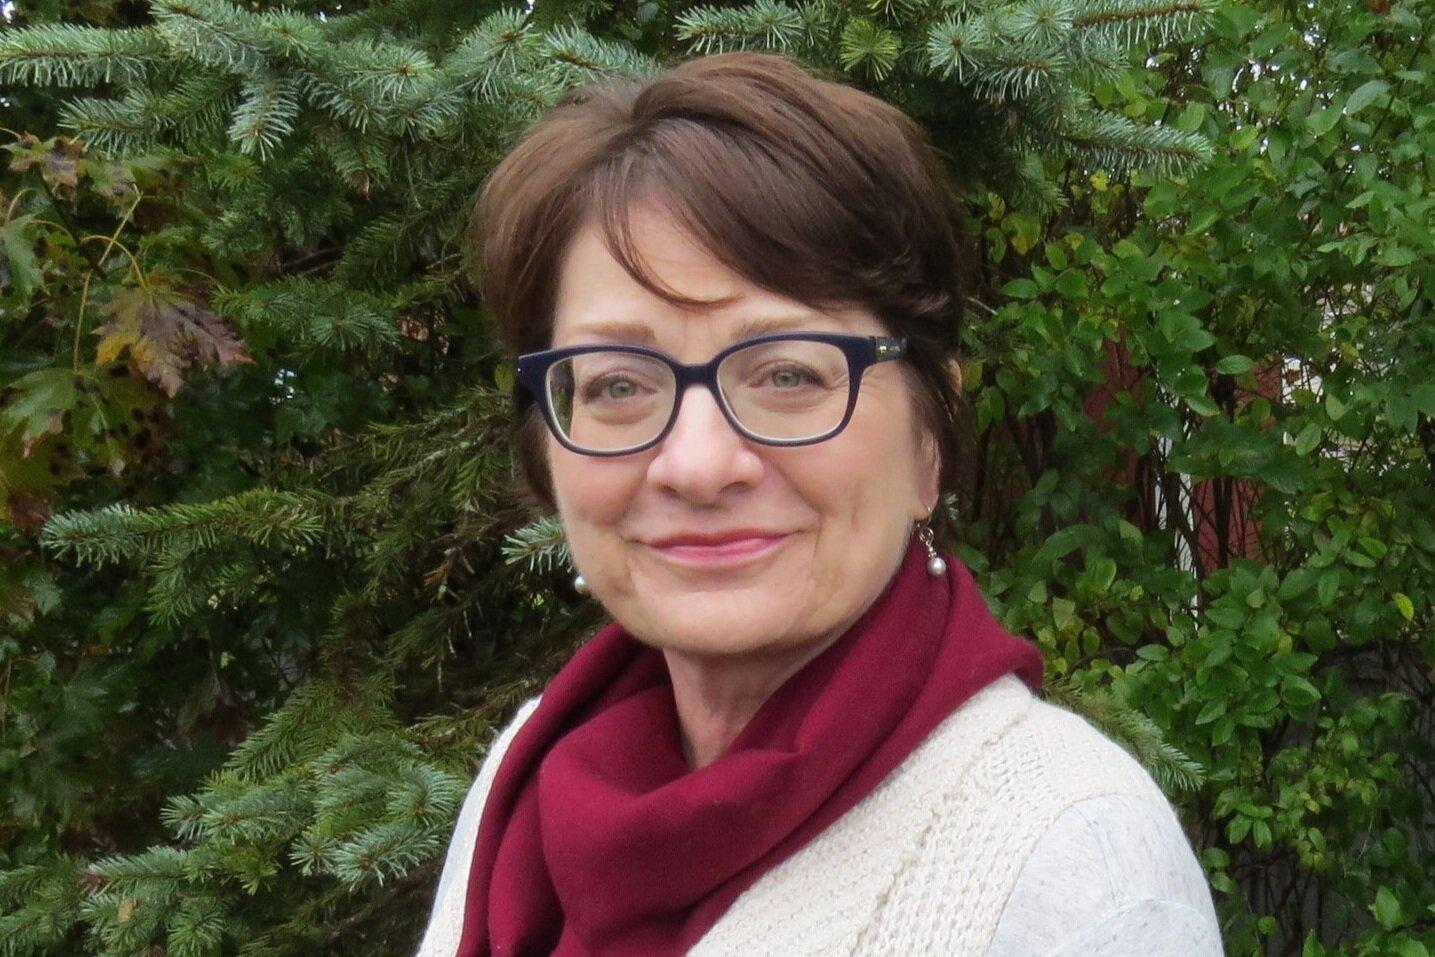 Anne Driscoll - Executive Director, Crescent Valley Resource Centre